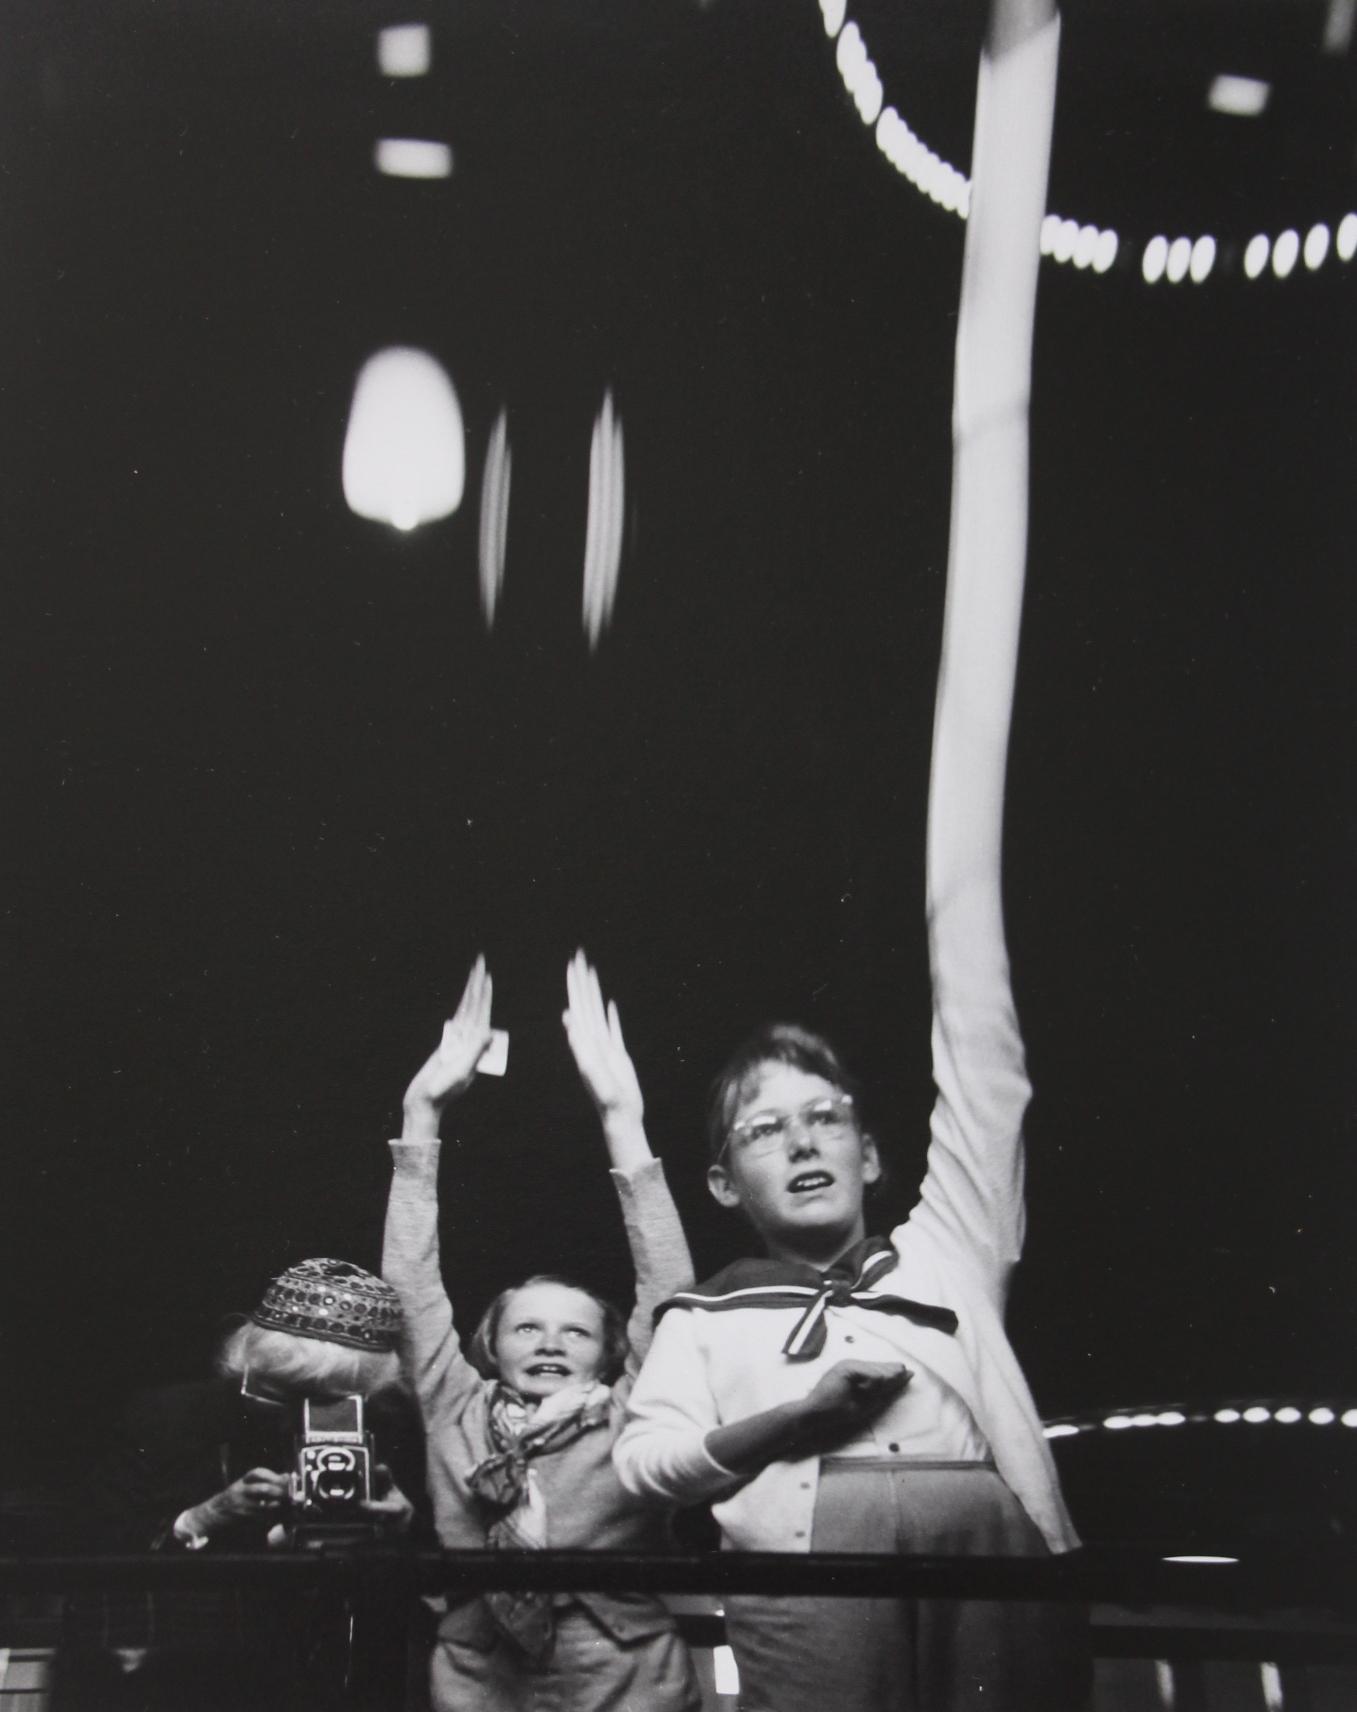 Imogen Cunningham_Self Portrait with Grandchildren in S.F Funhouse_1955.JPG